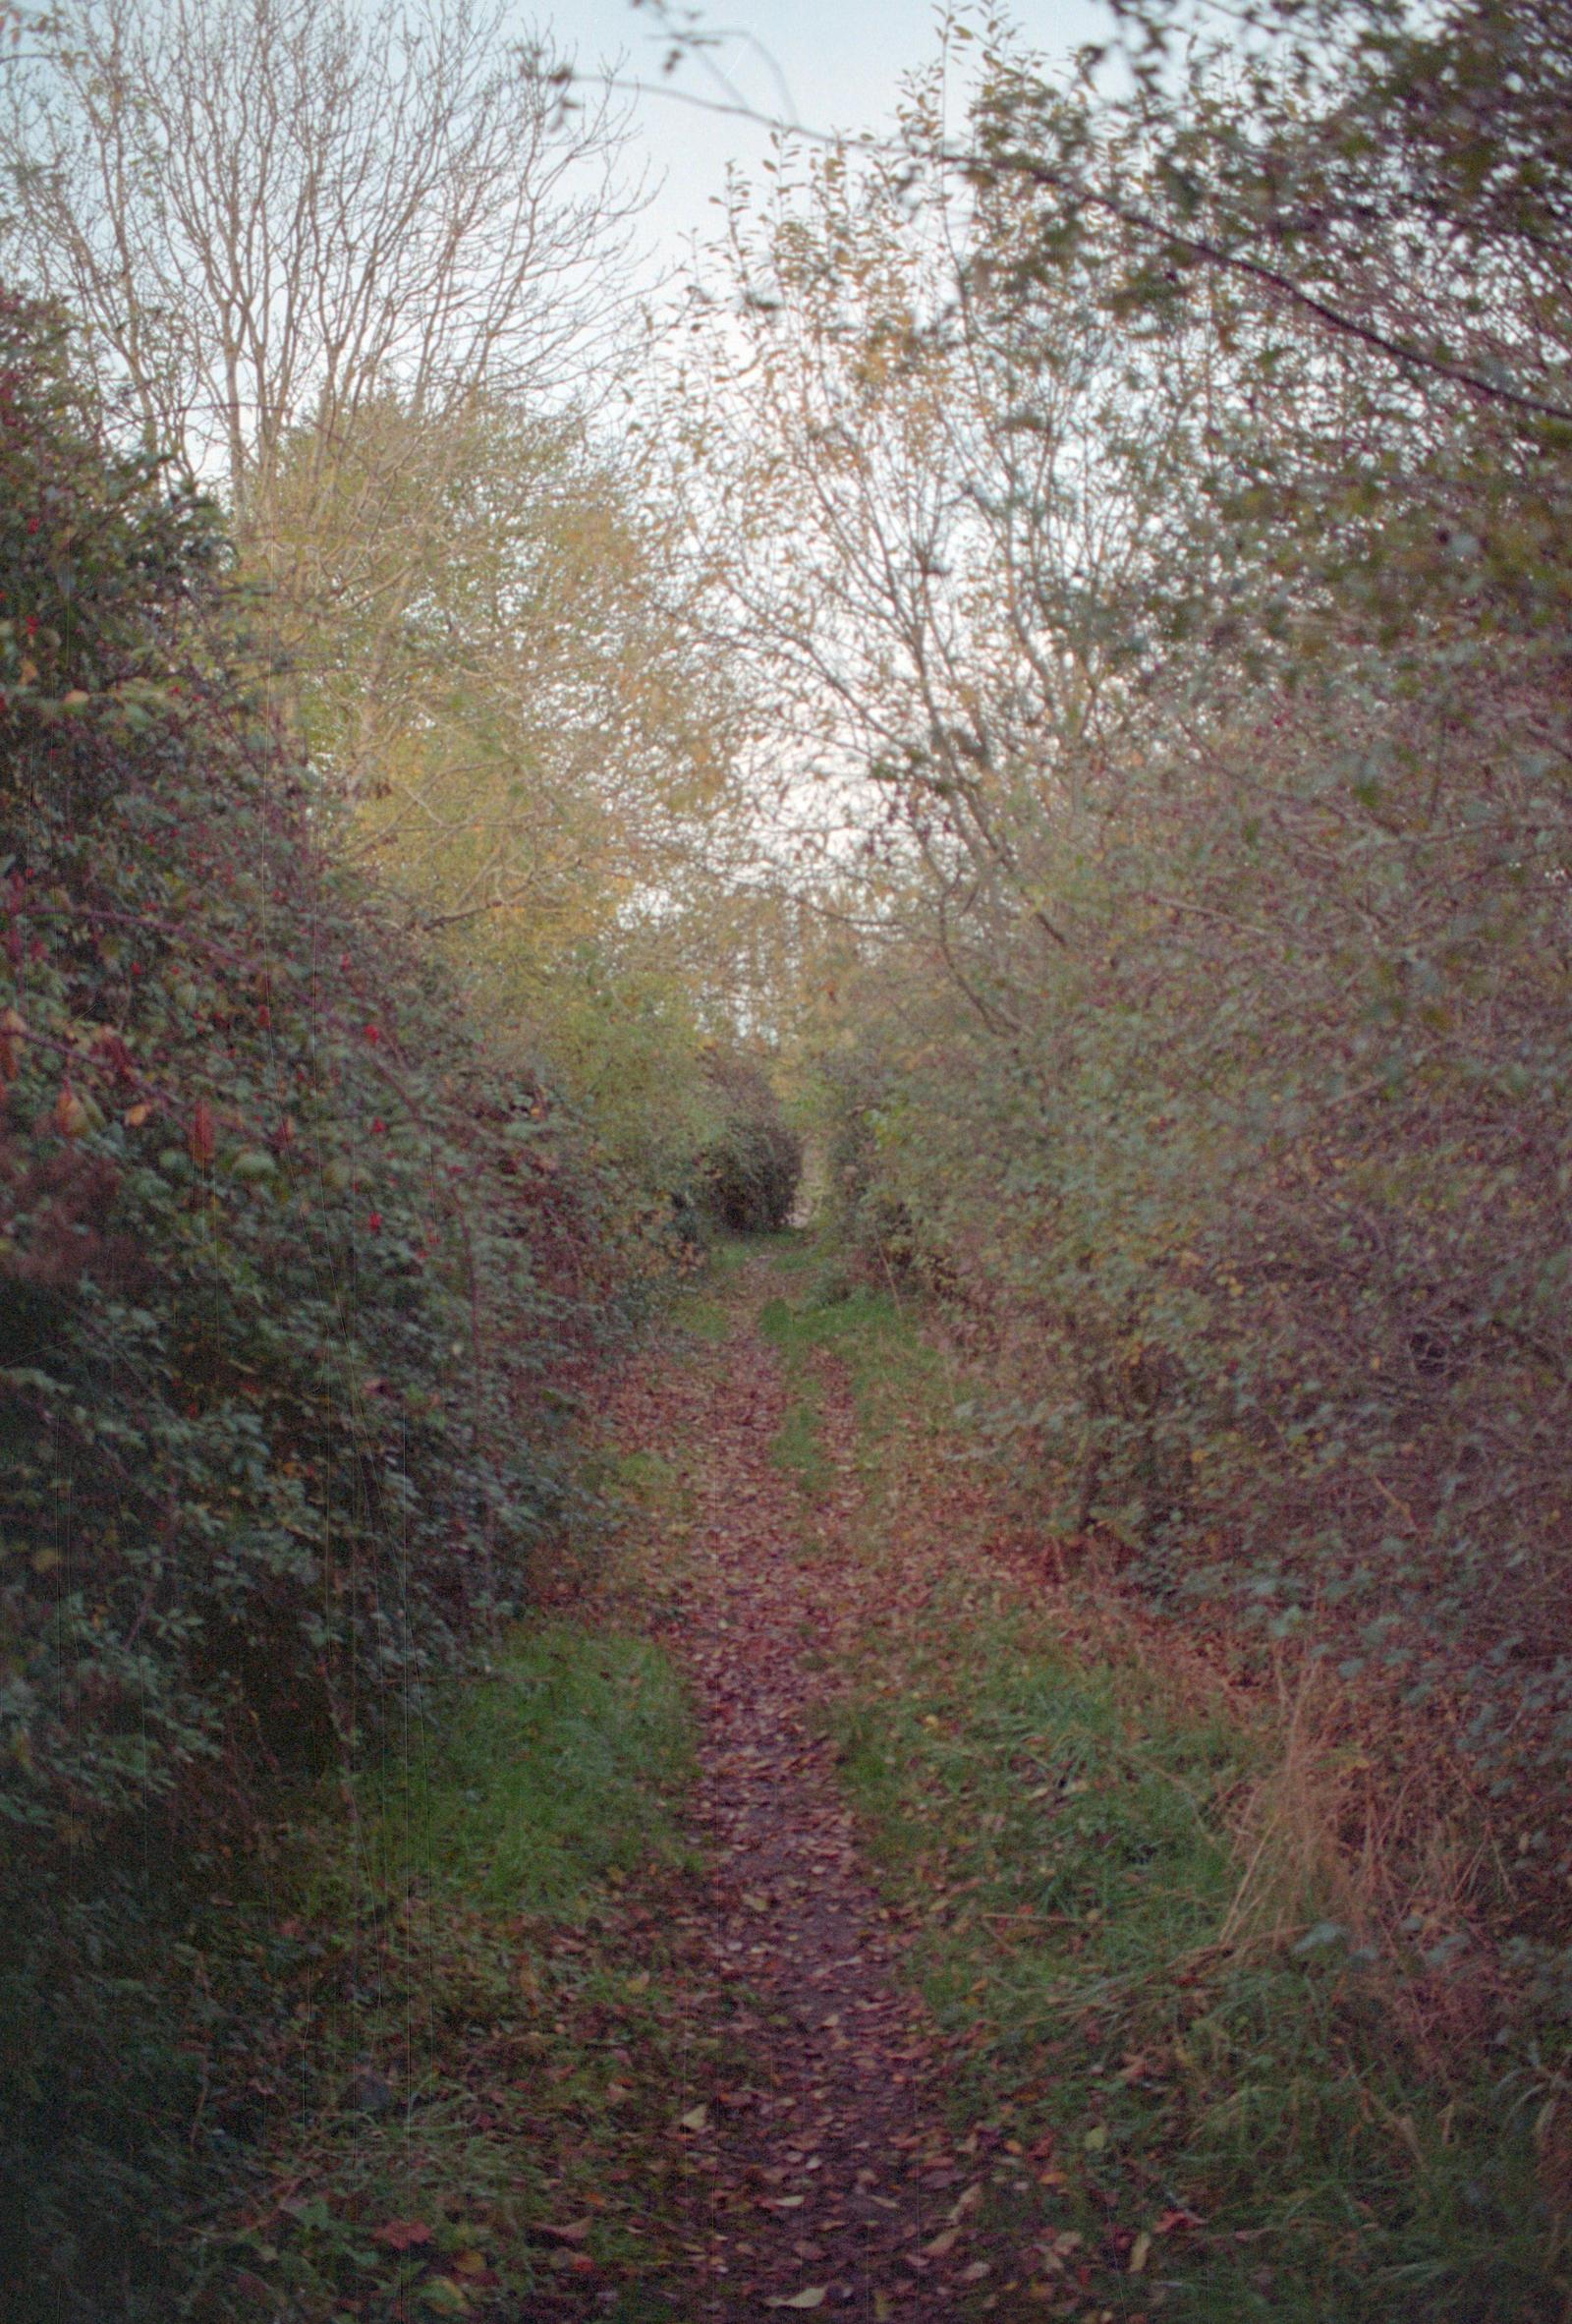 Contradictory path